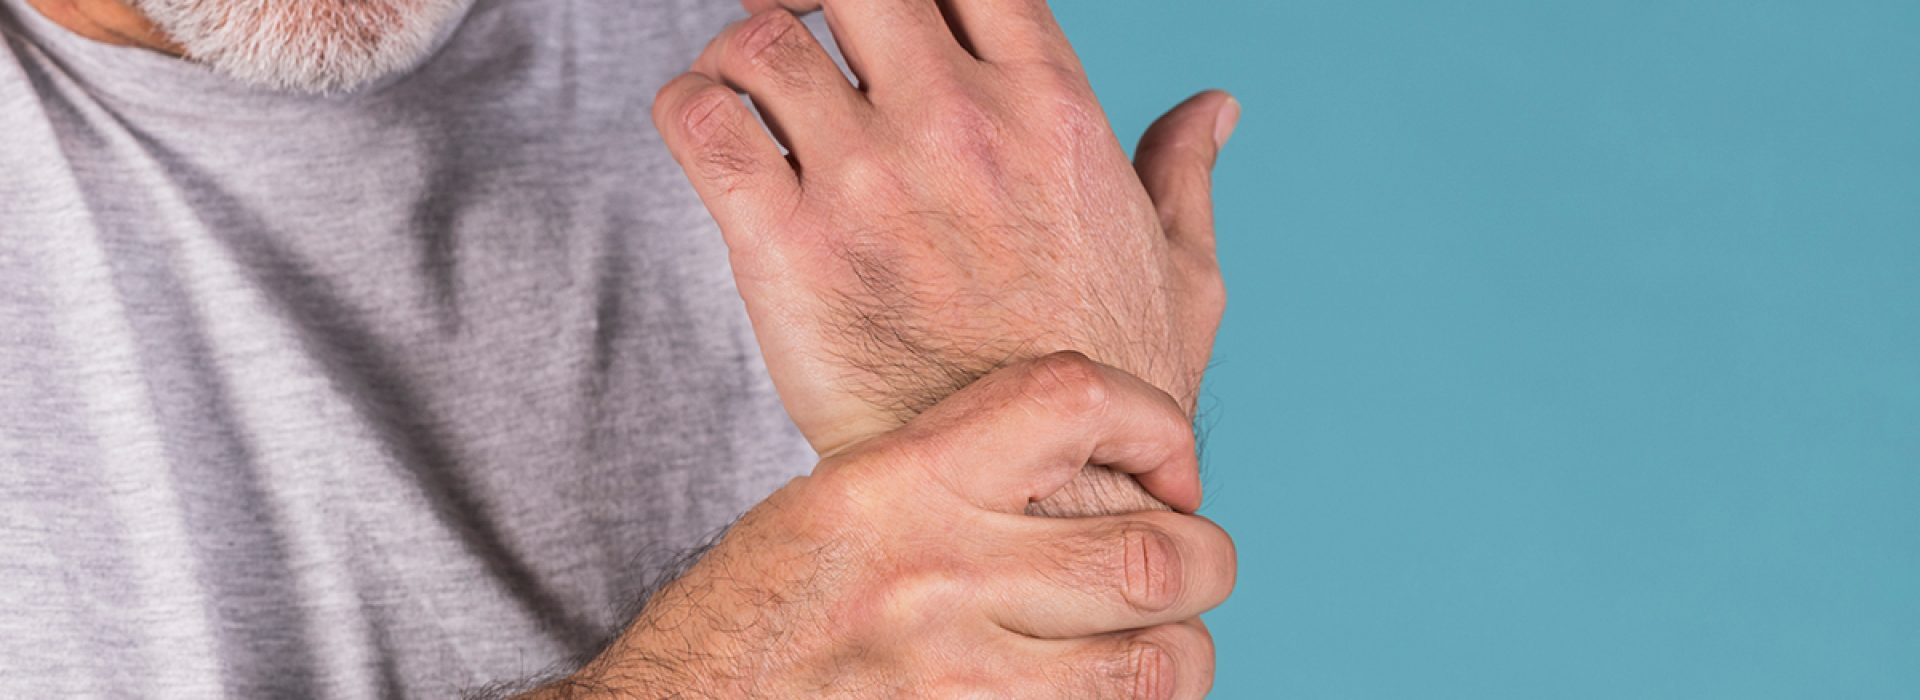 colageno-dolores-articulares